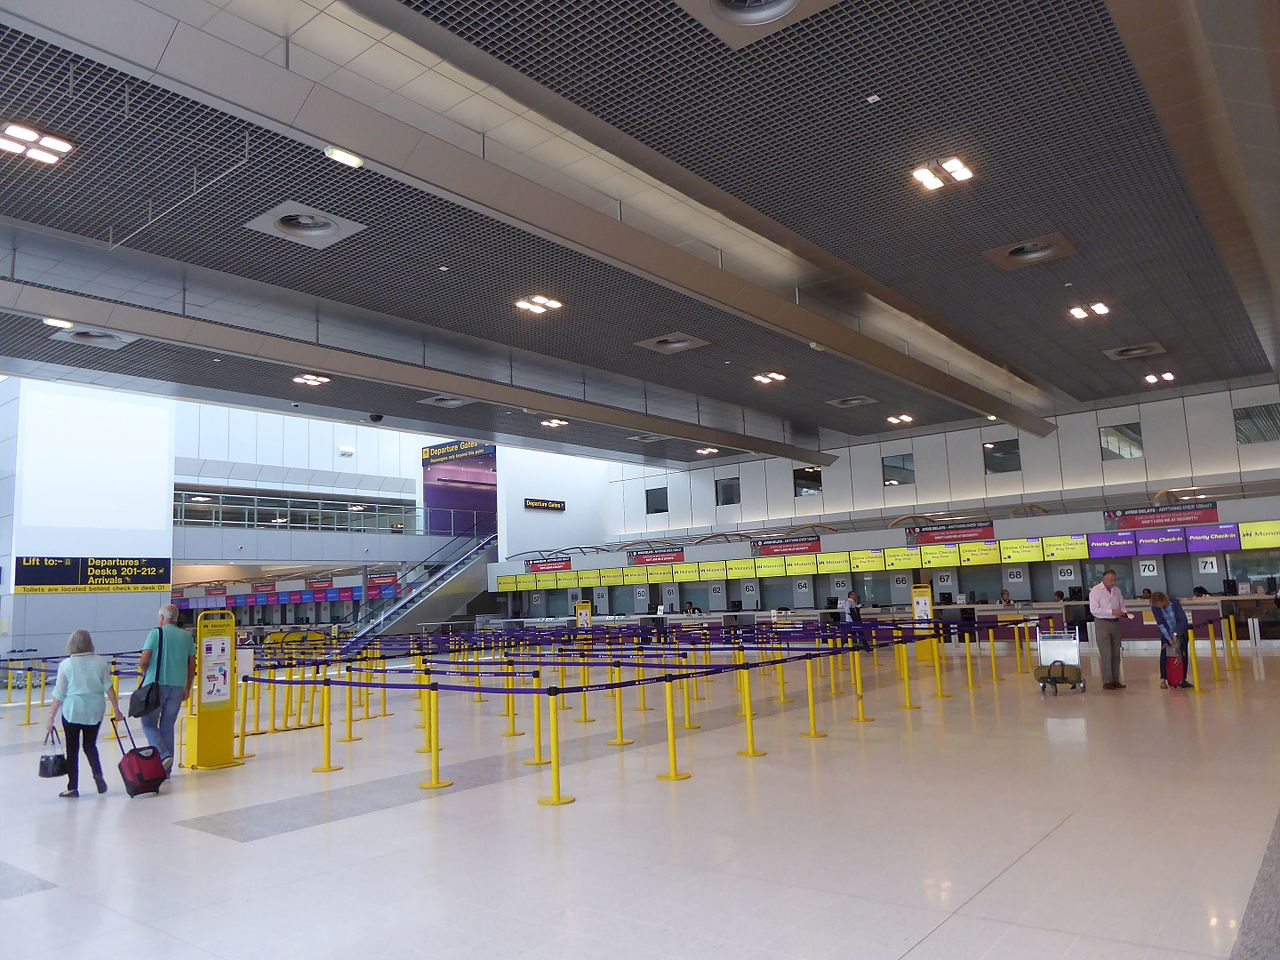 File:Terminal 2, Manchester Airport, June 2016 (01).JPG ...